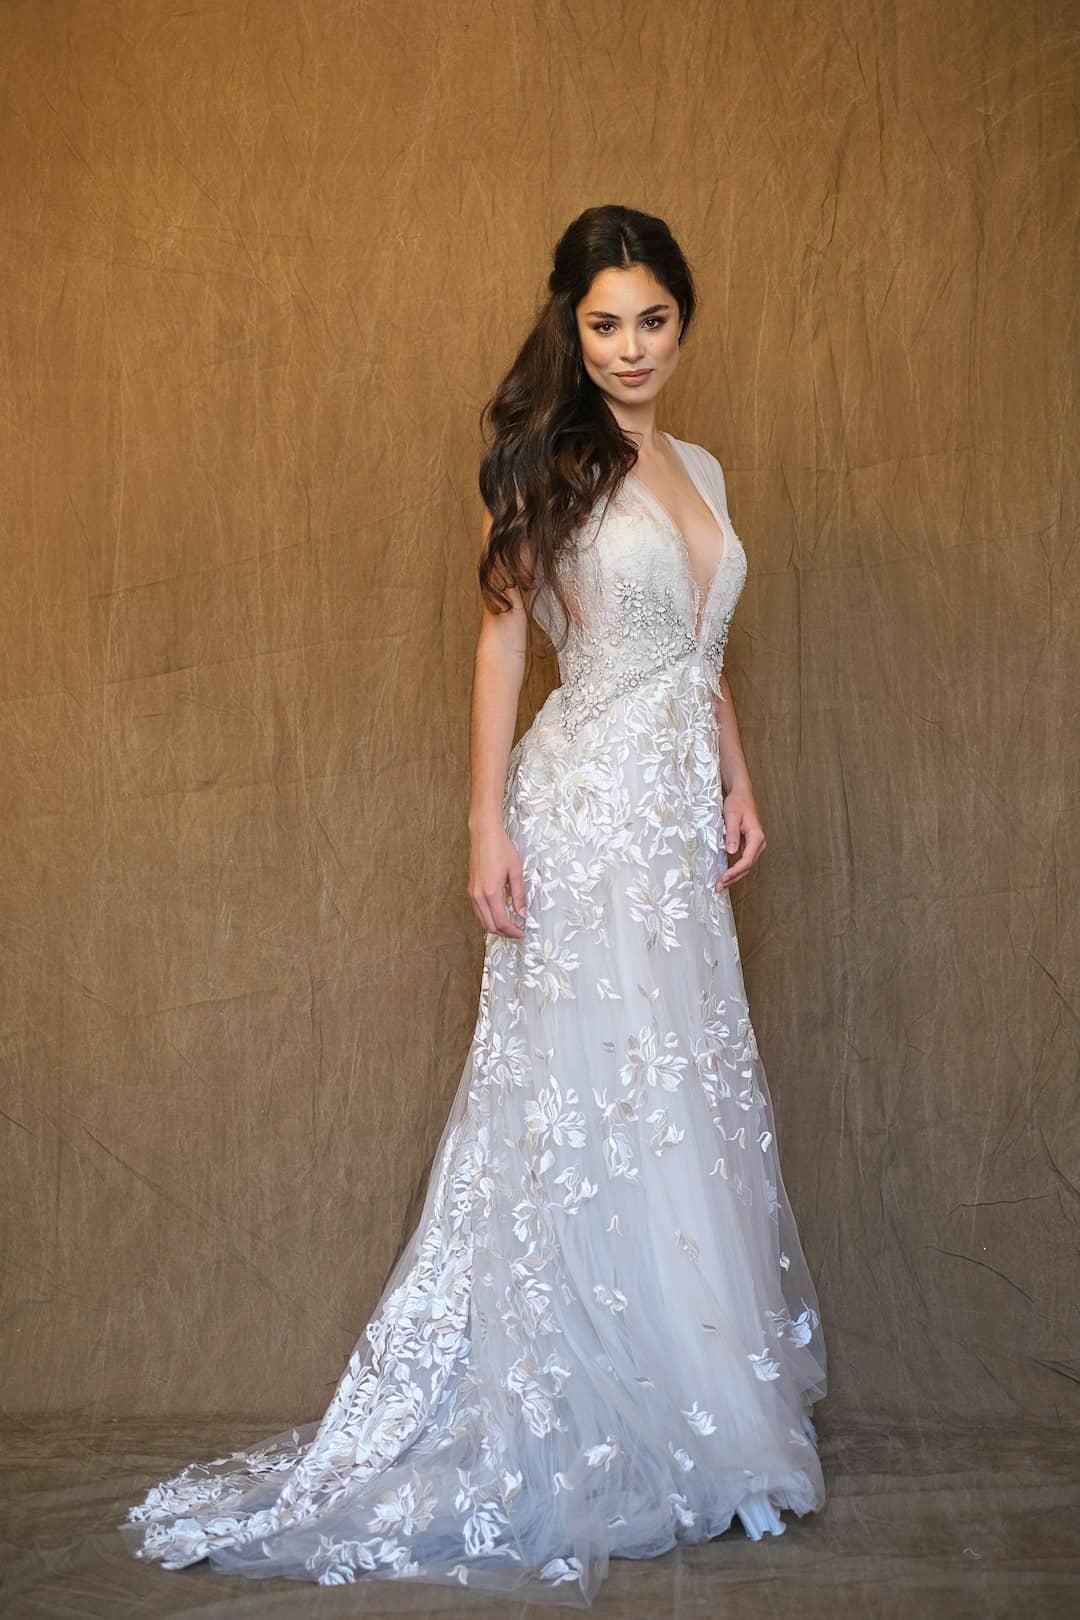 Romantic wedding dress - Marco&Maria - 2017-1017- front